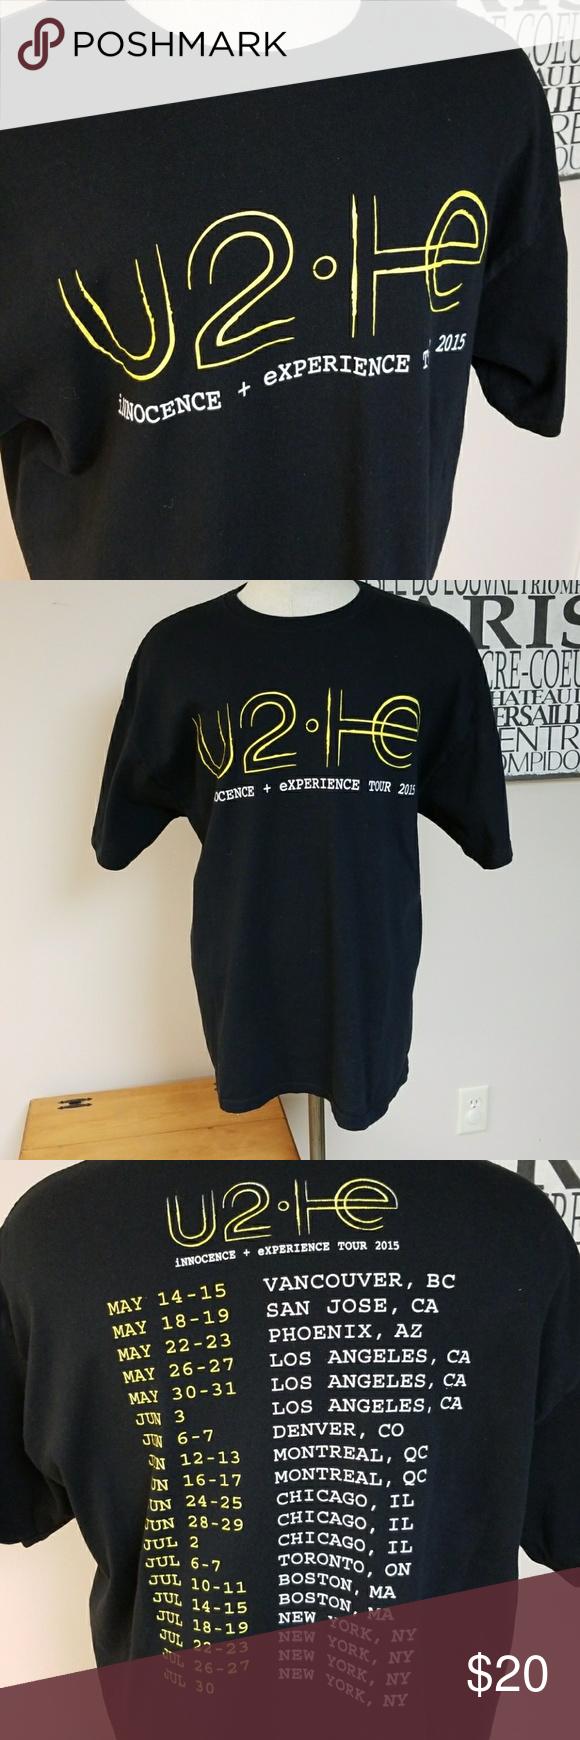 Black keys t shirt etsy - Black Keys T Shirt Etsy 53